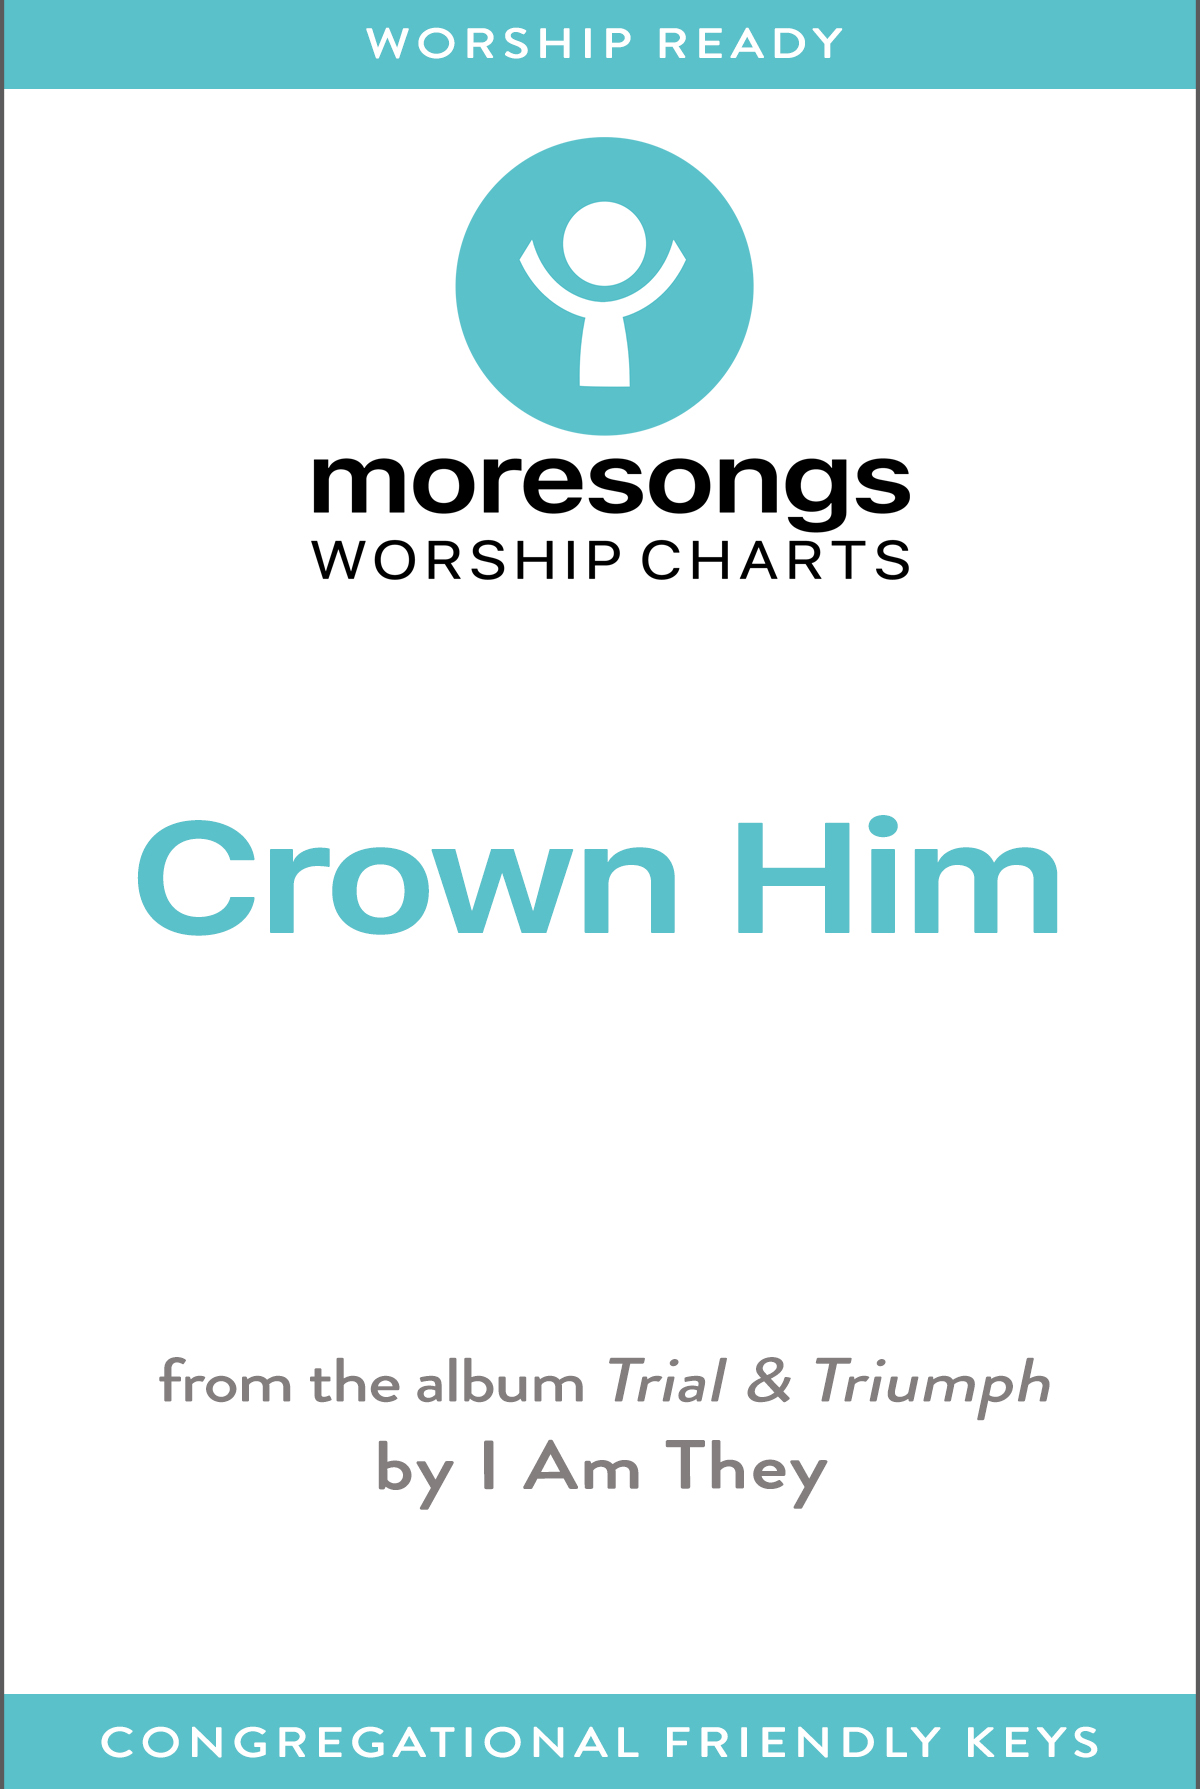 More Songs Worship Charts